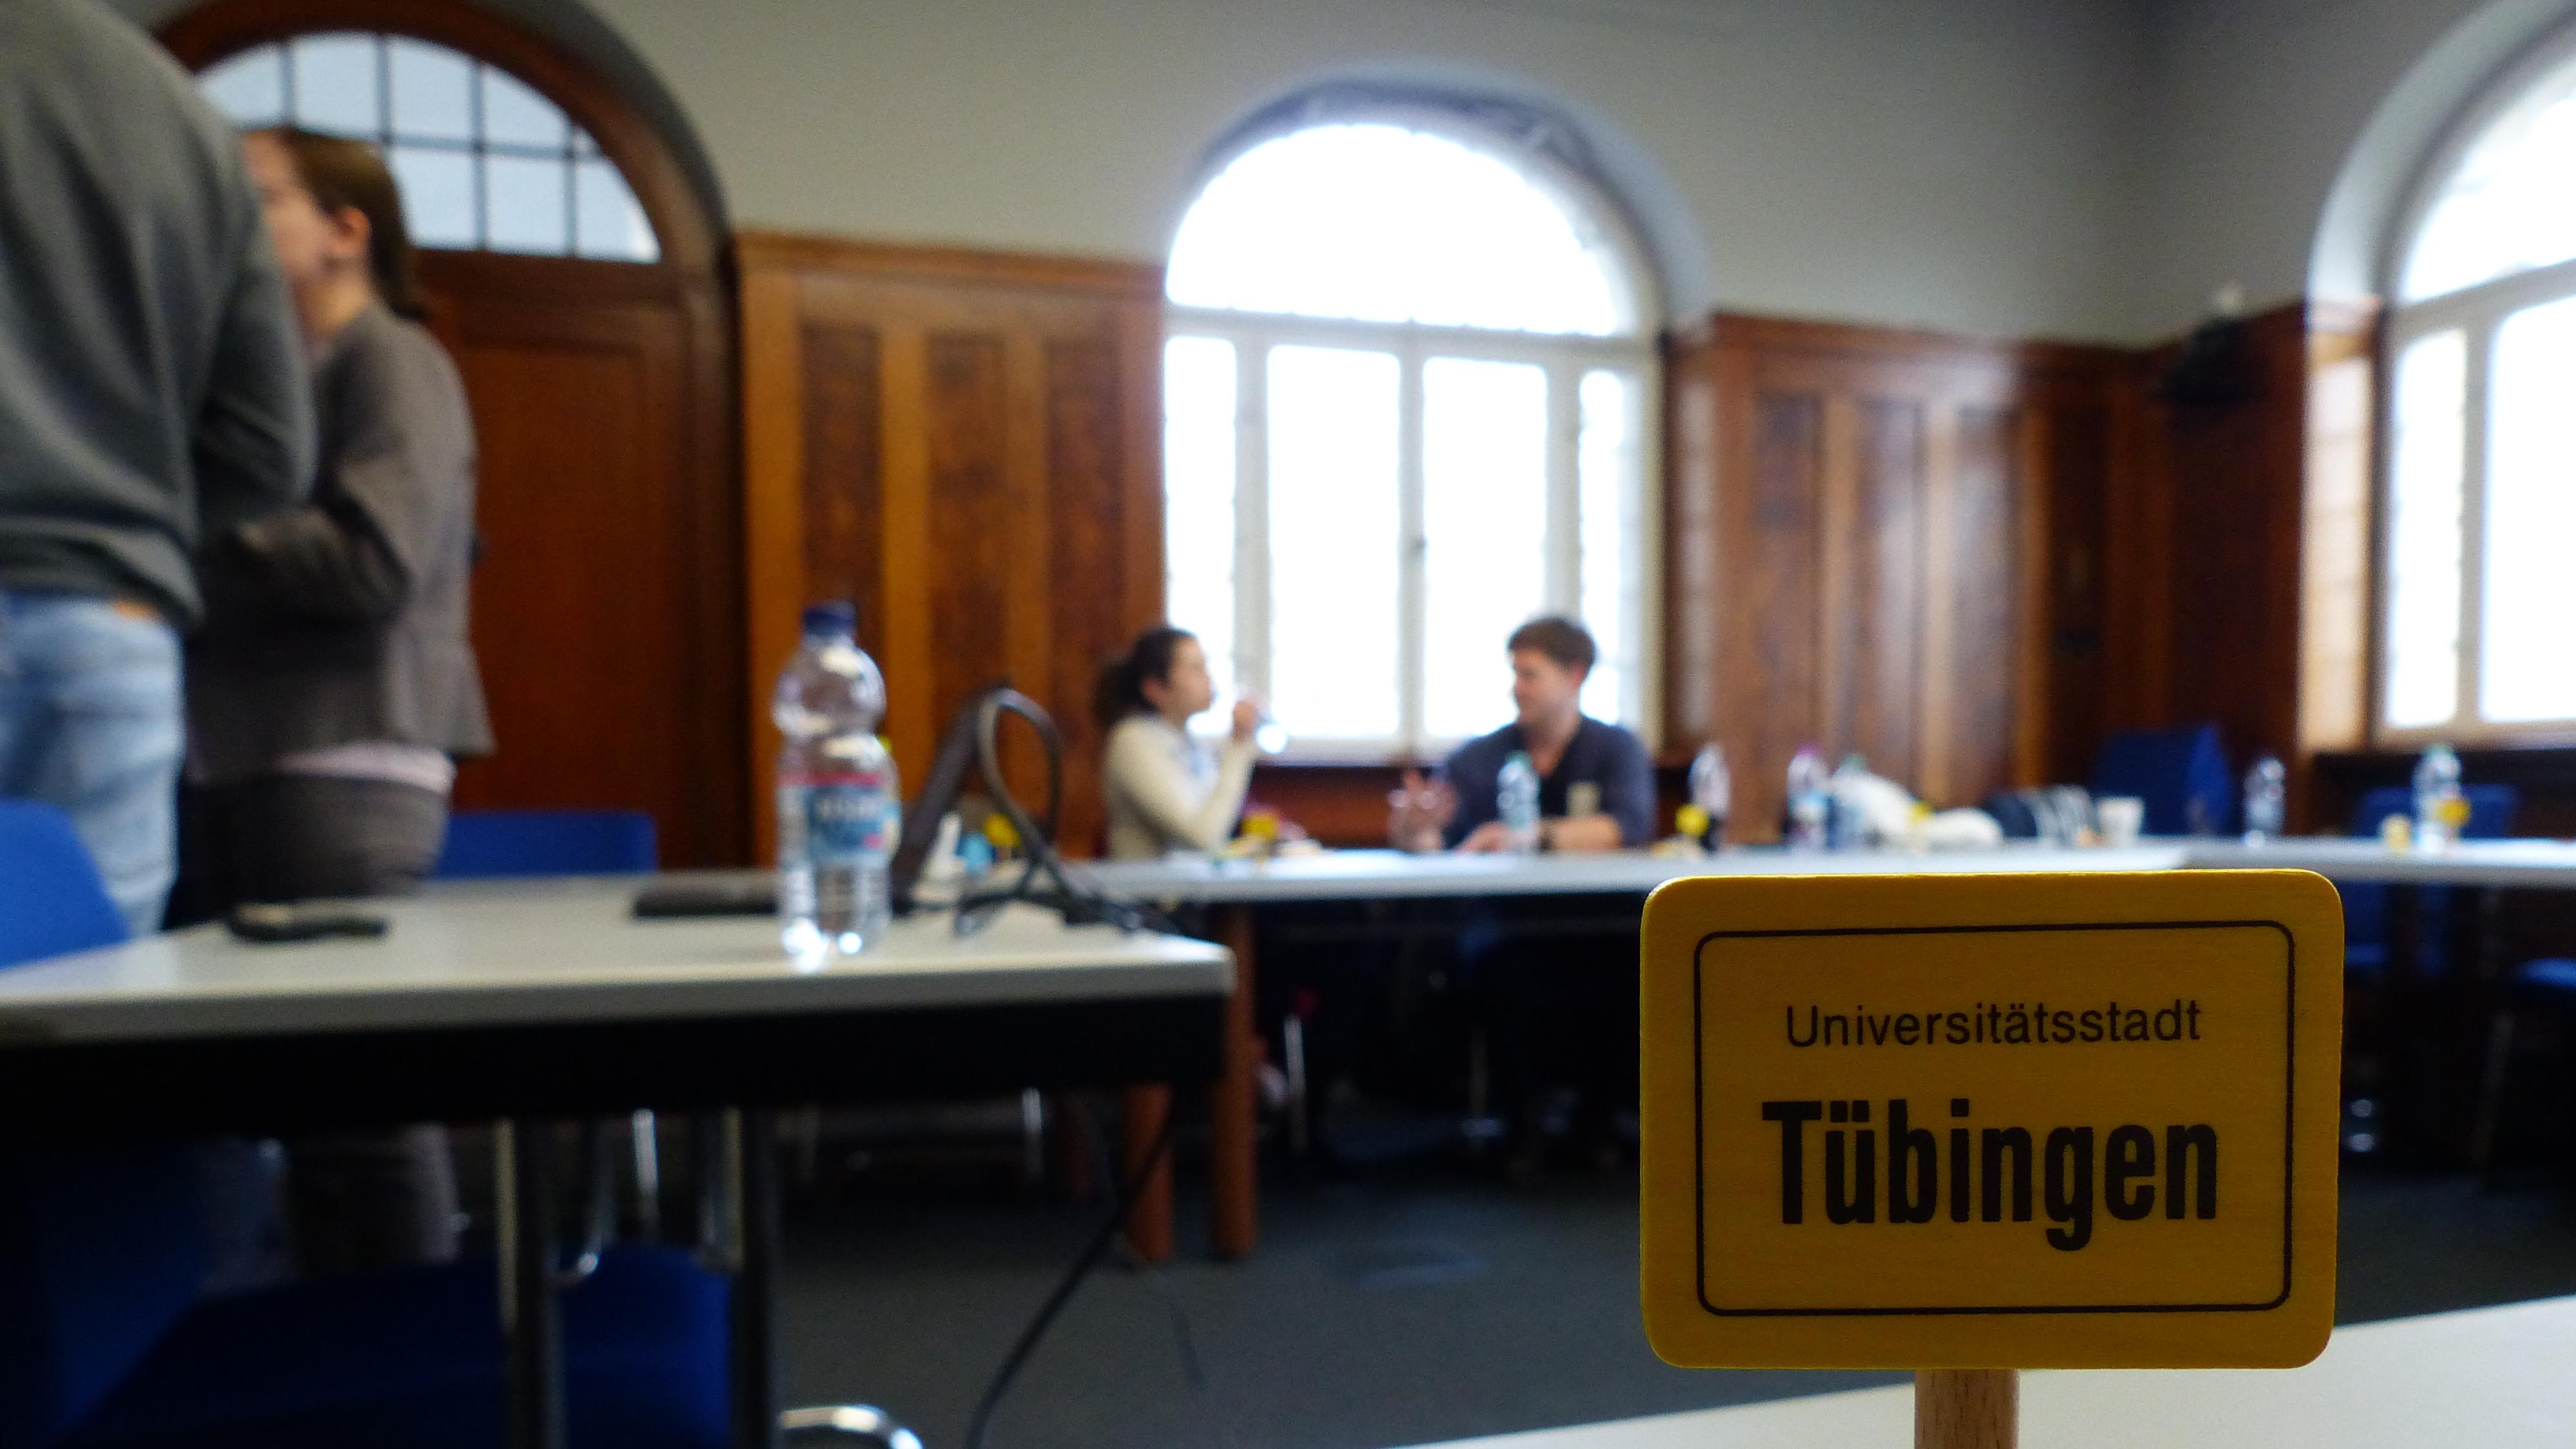 Fakultat Universitat Tubingen